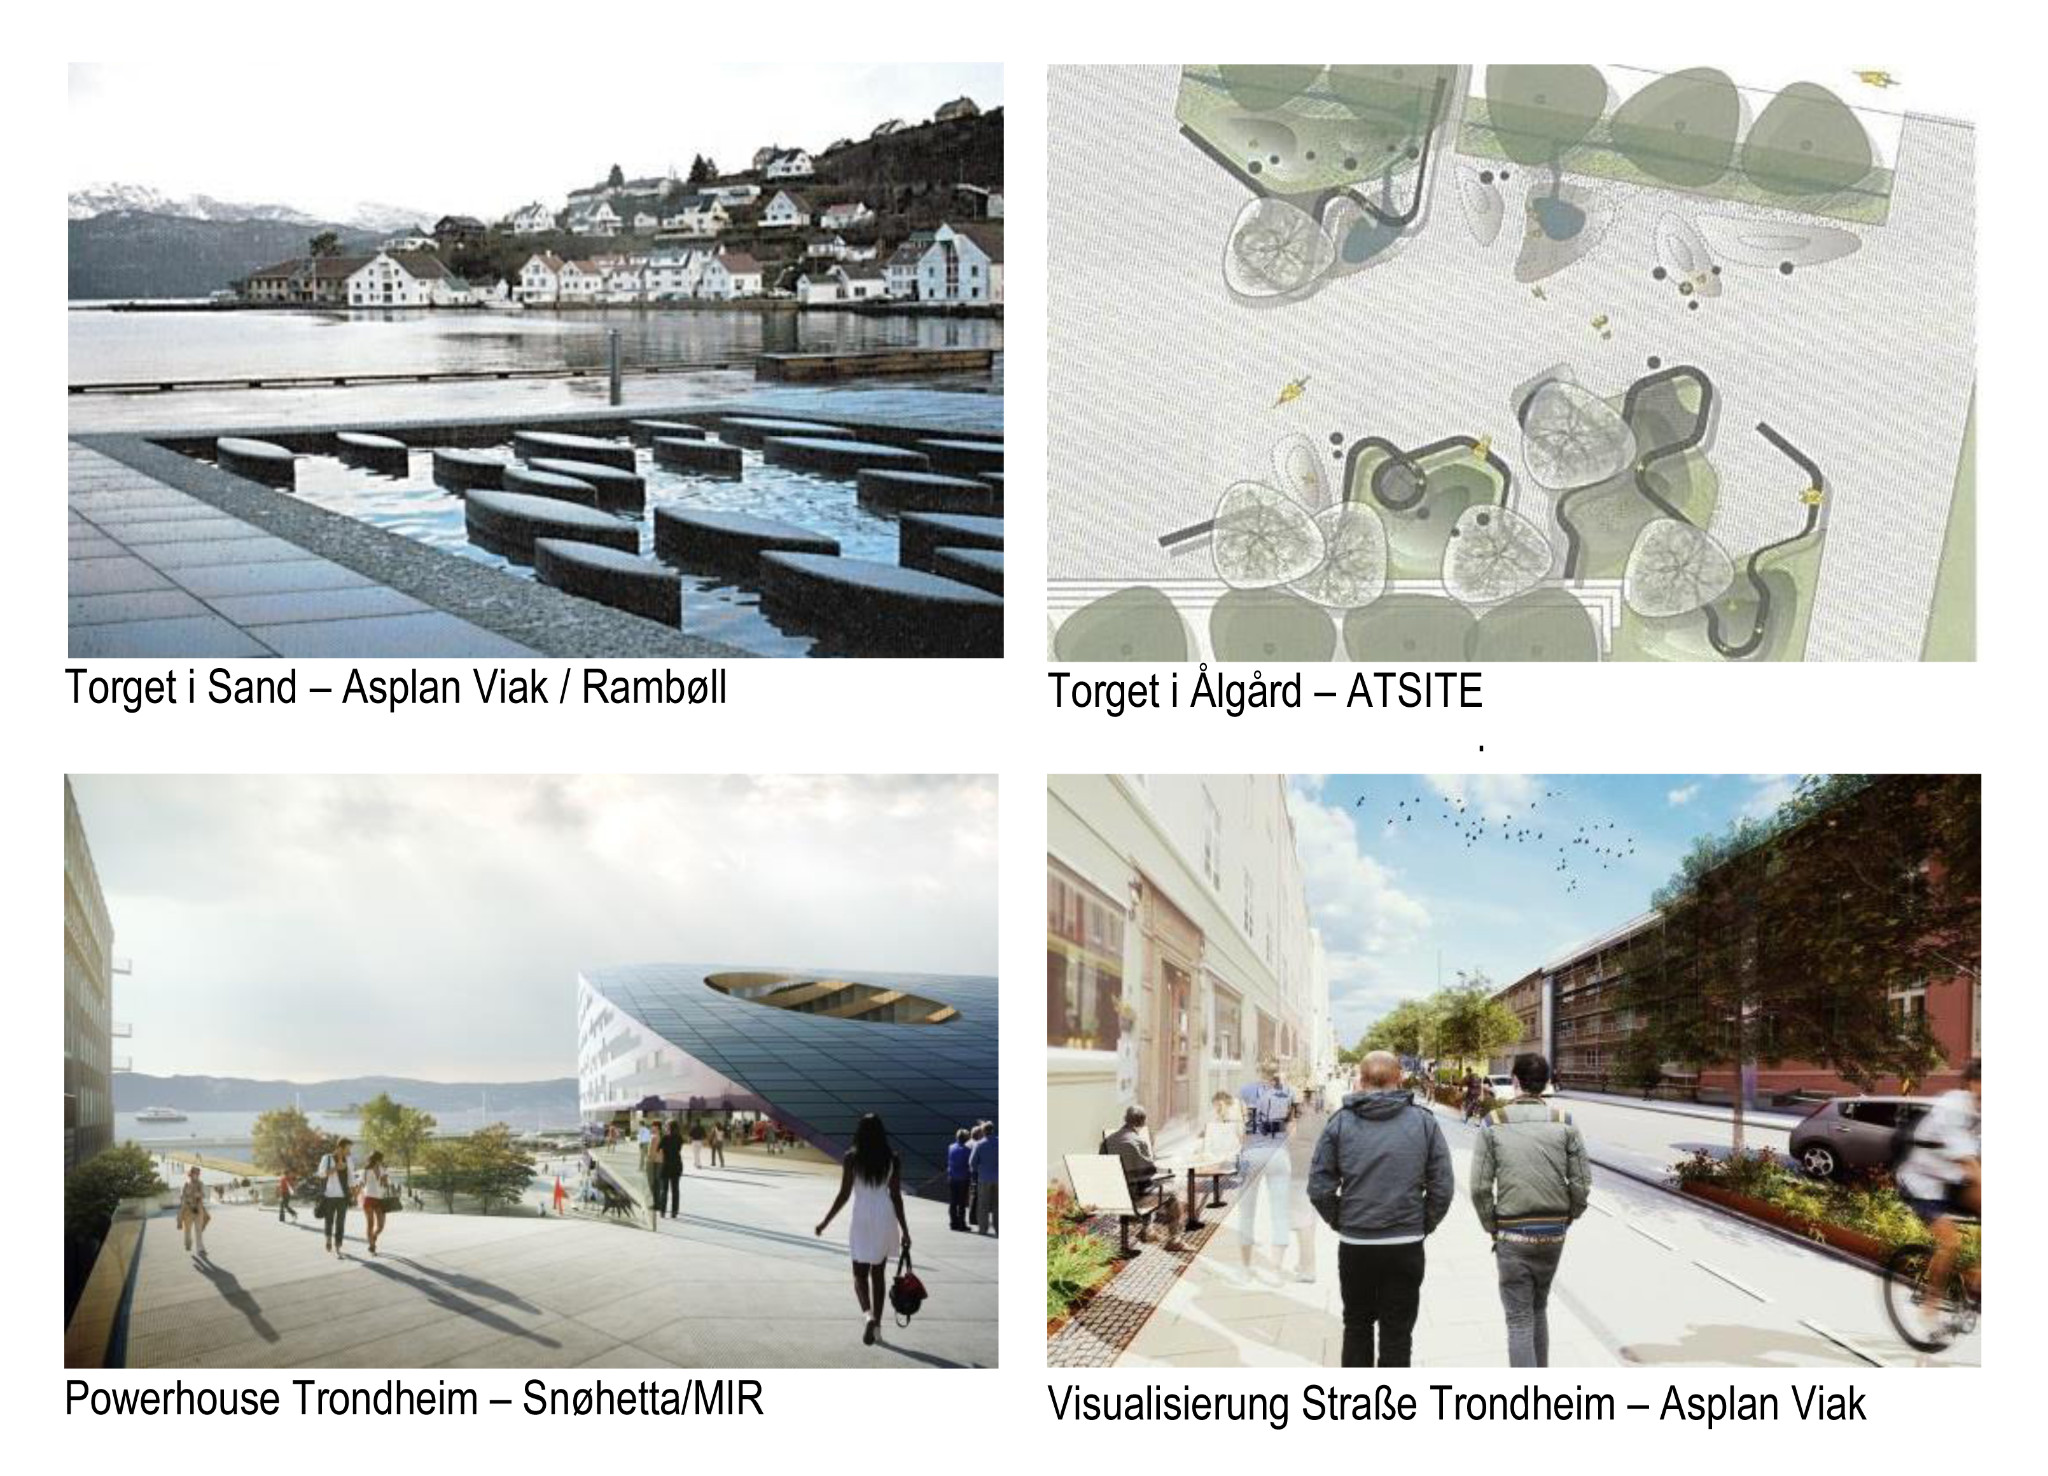 Asplan Viak / Ramboll; ATSITE; Snøhetta/MIR, Norske landskapsarchitekters forening: Årbok 2019